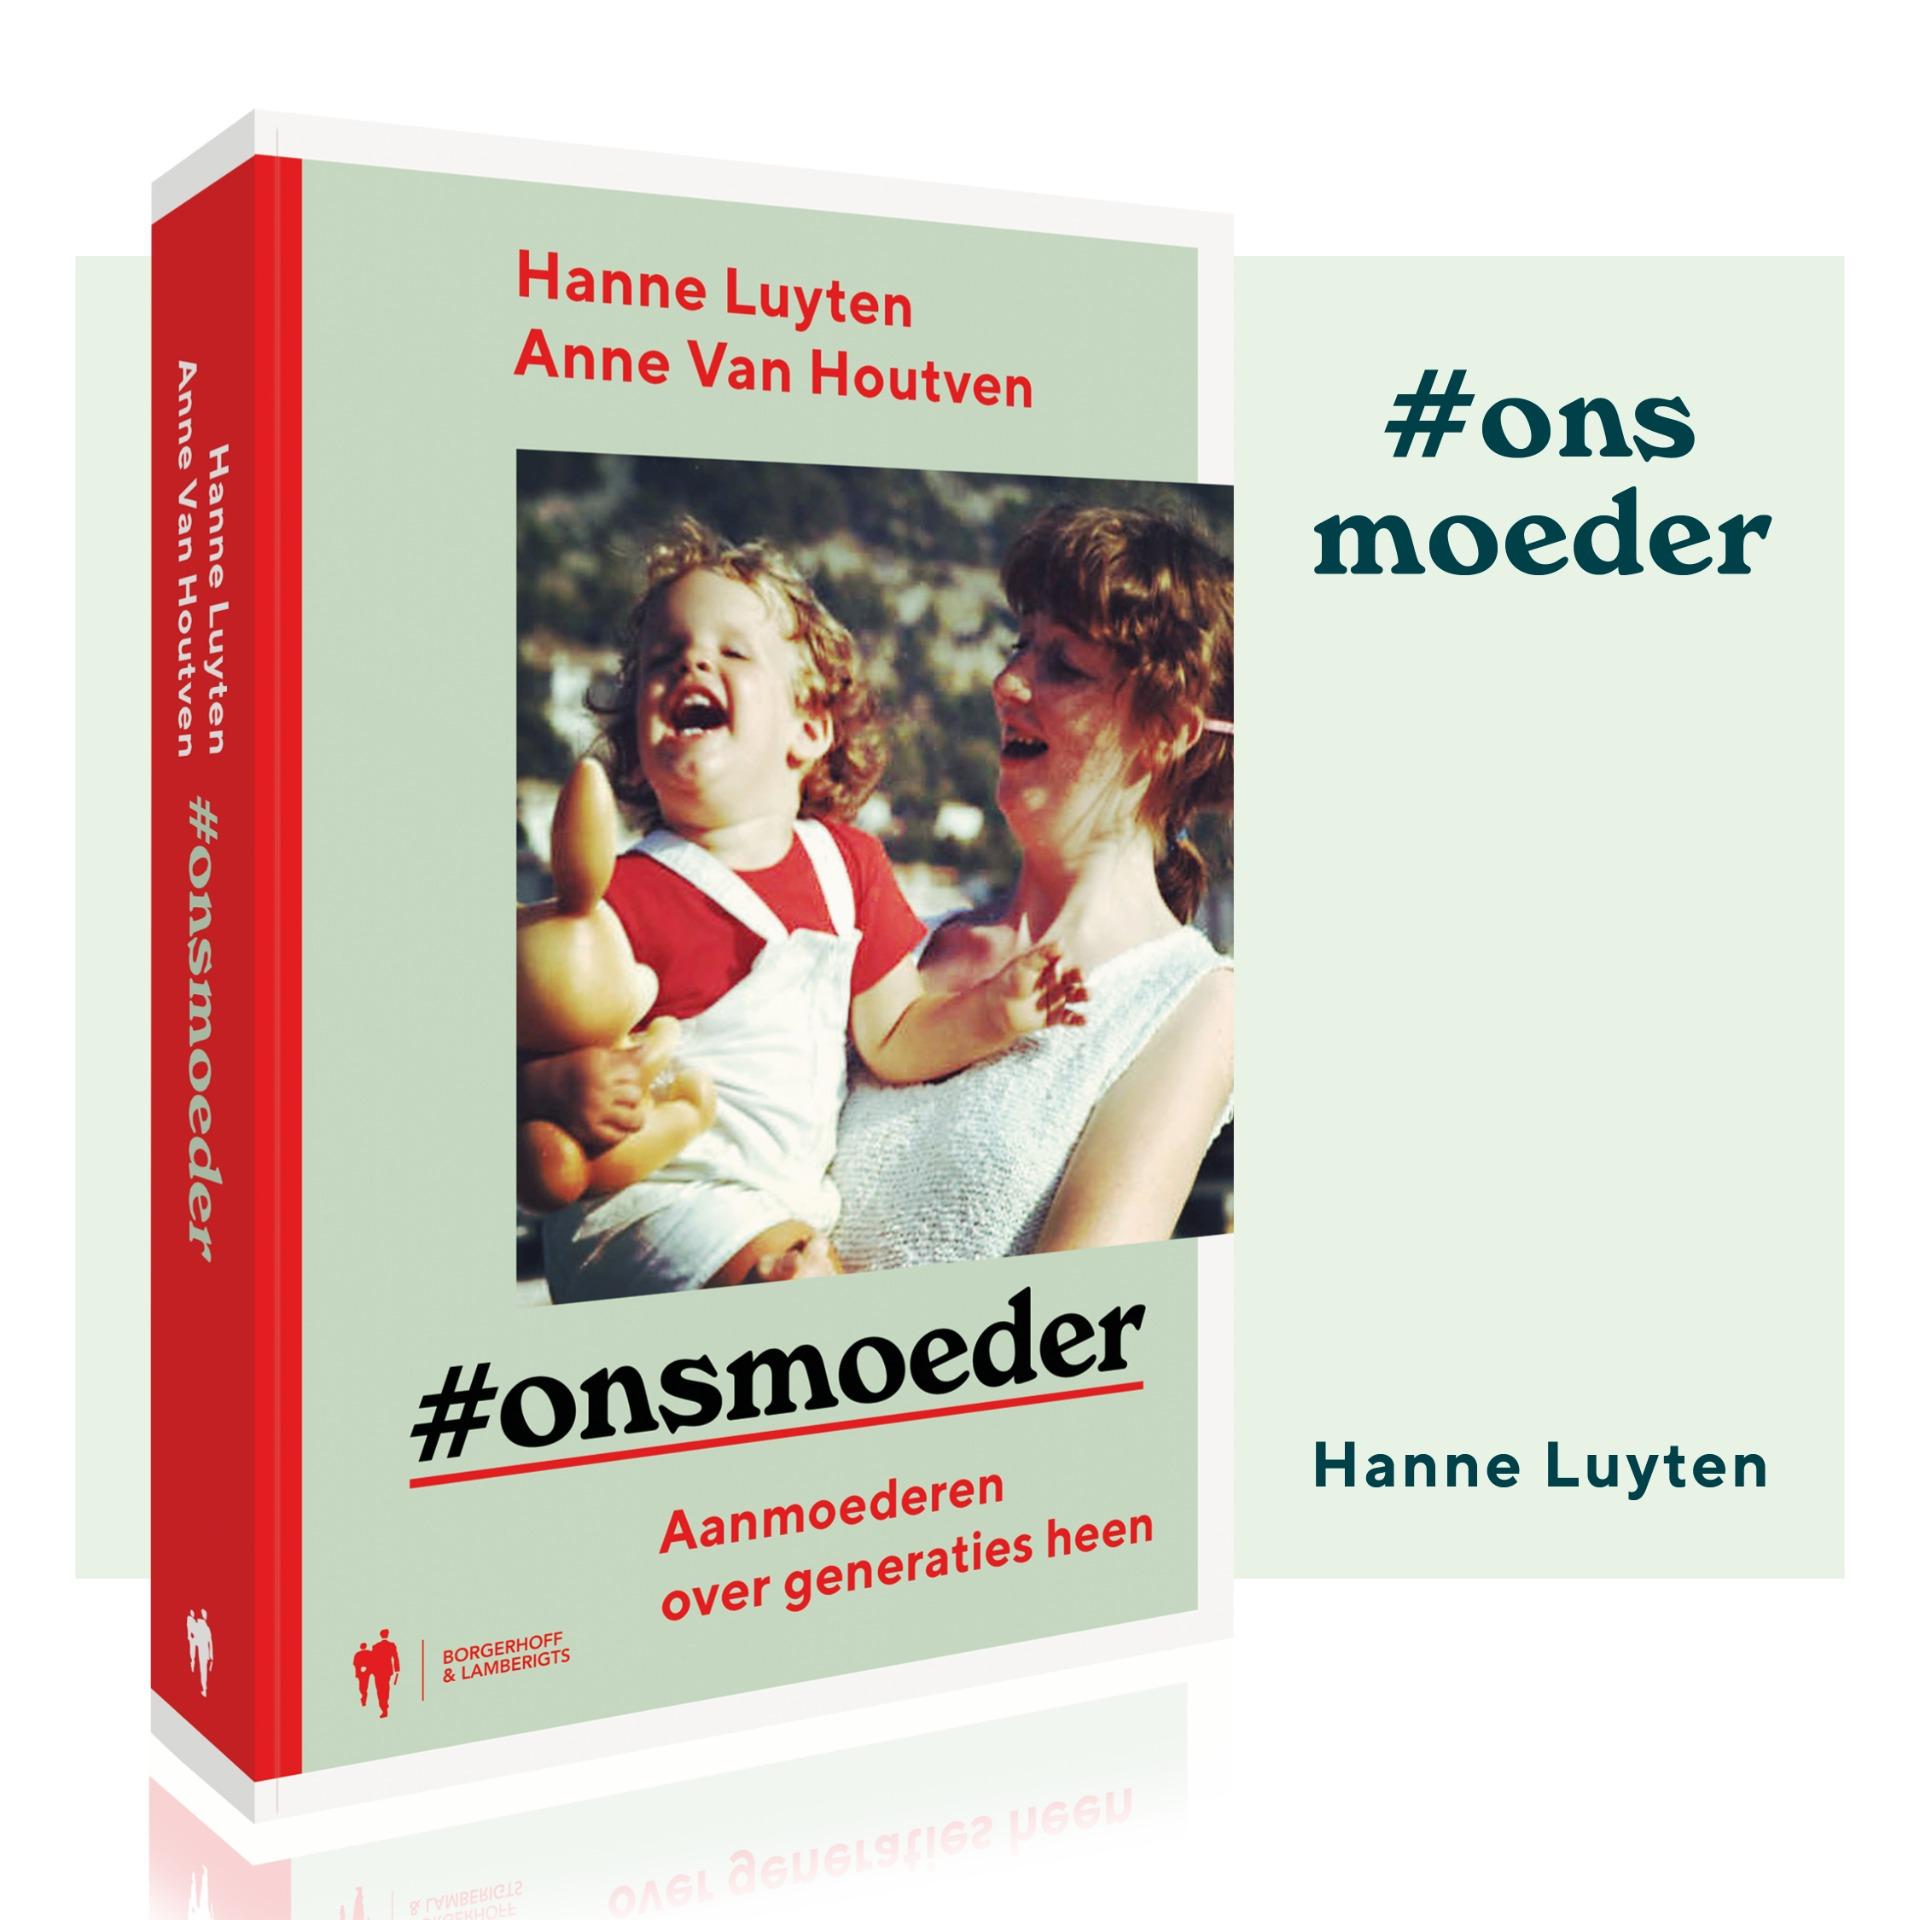 #onsmoeder